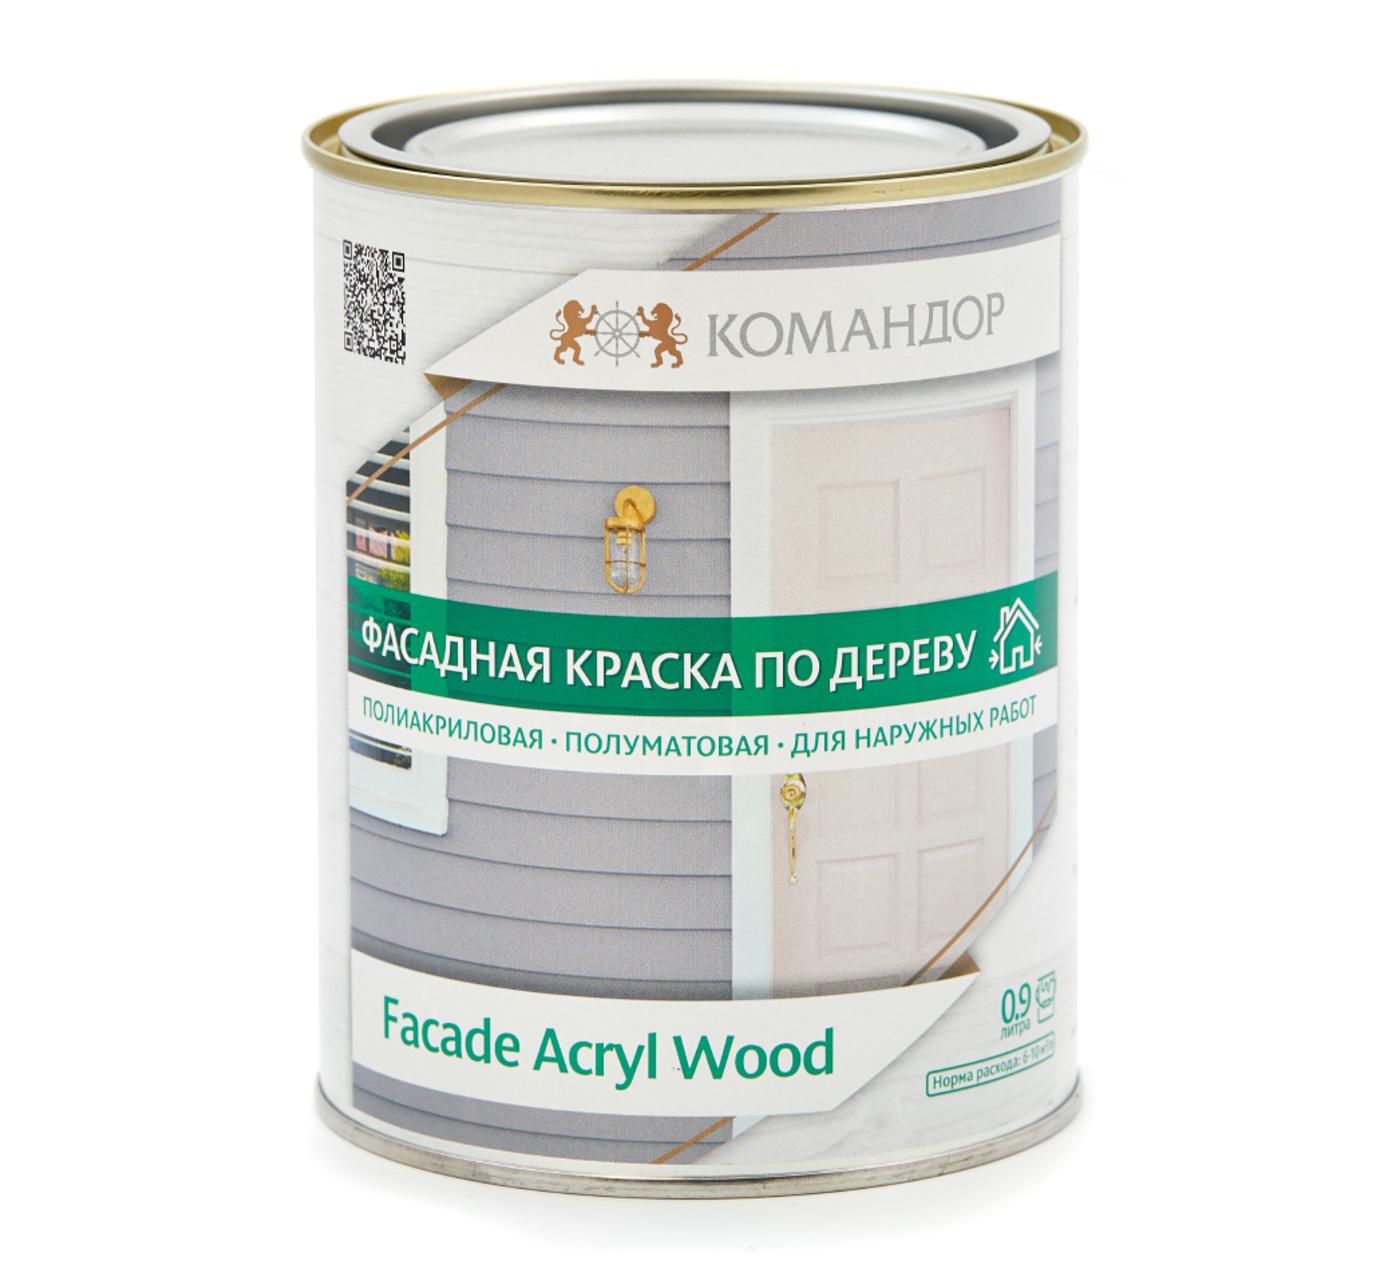 FAСADE ACRYL WOOD PM1 фасадная краска по дереву